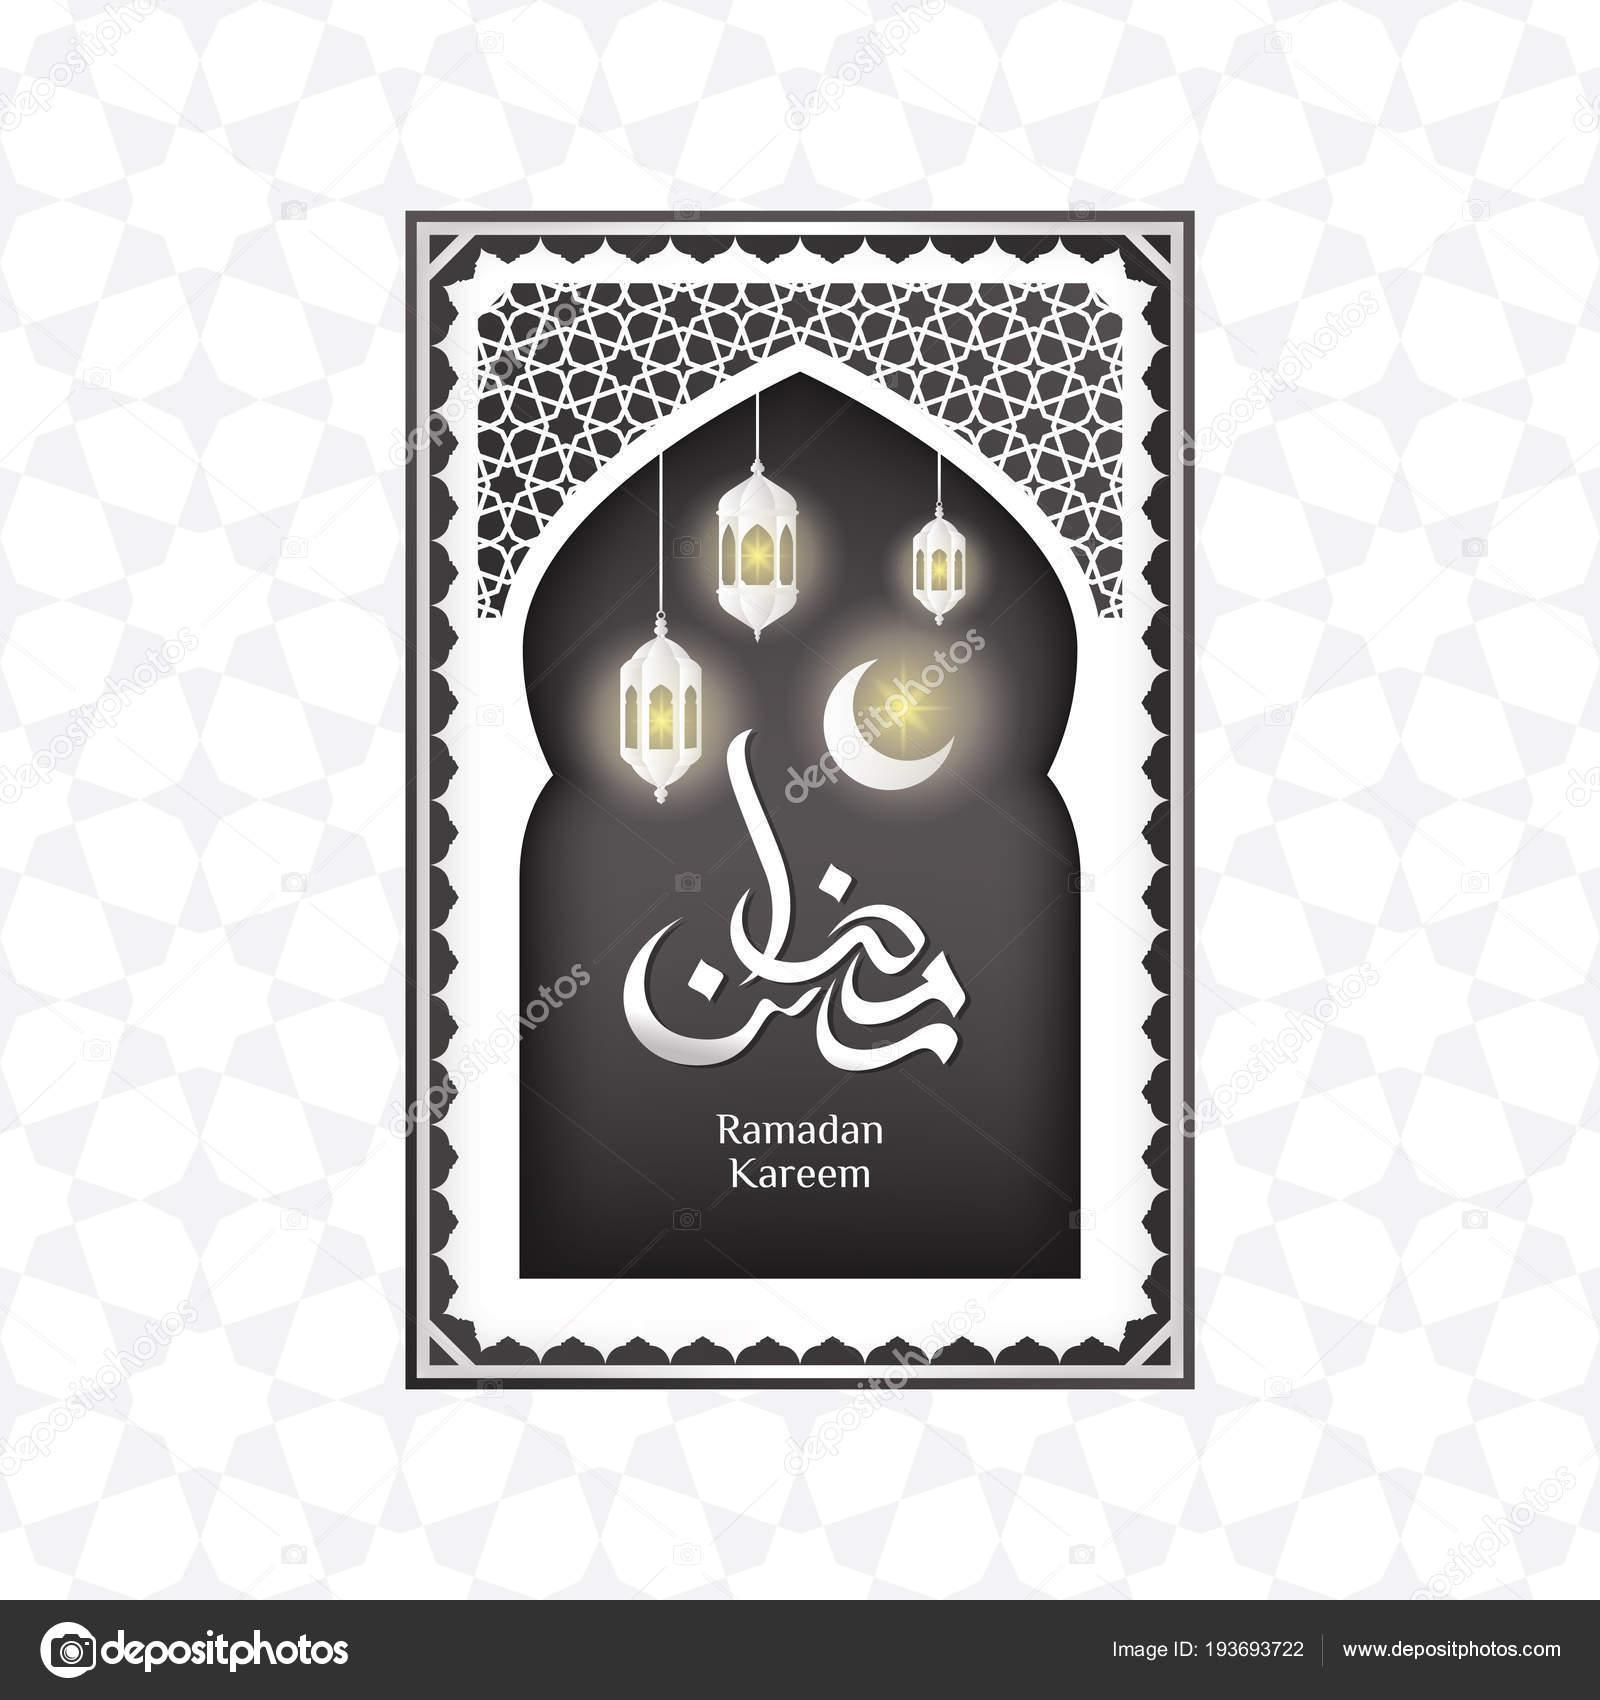 Ramadan greeting card crescent mosque window arabic ornament stock ramadan greeting card with crescent in mosque window and arabic ornament vector by irfanfirdaus19yahoo m4hsunfo